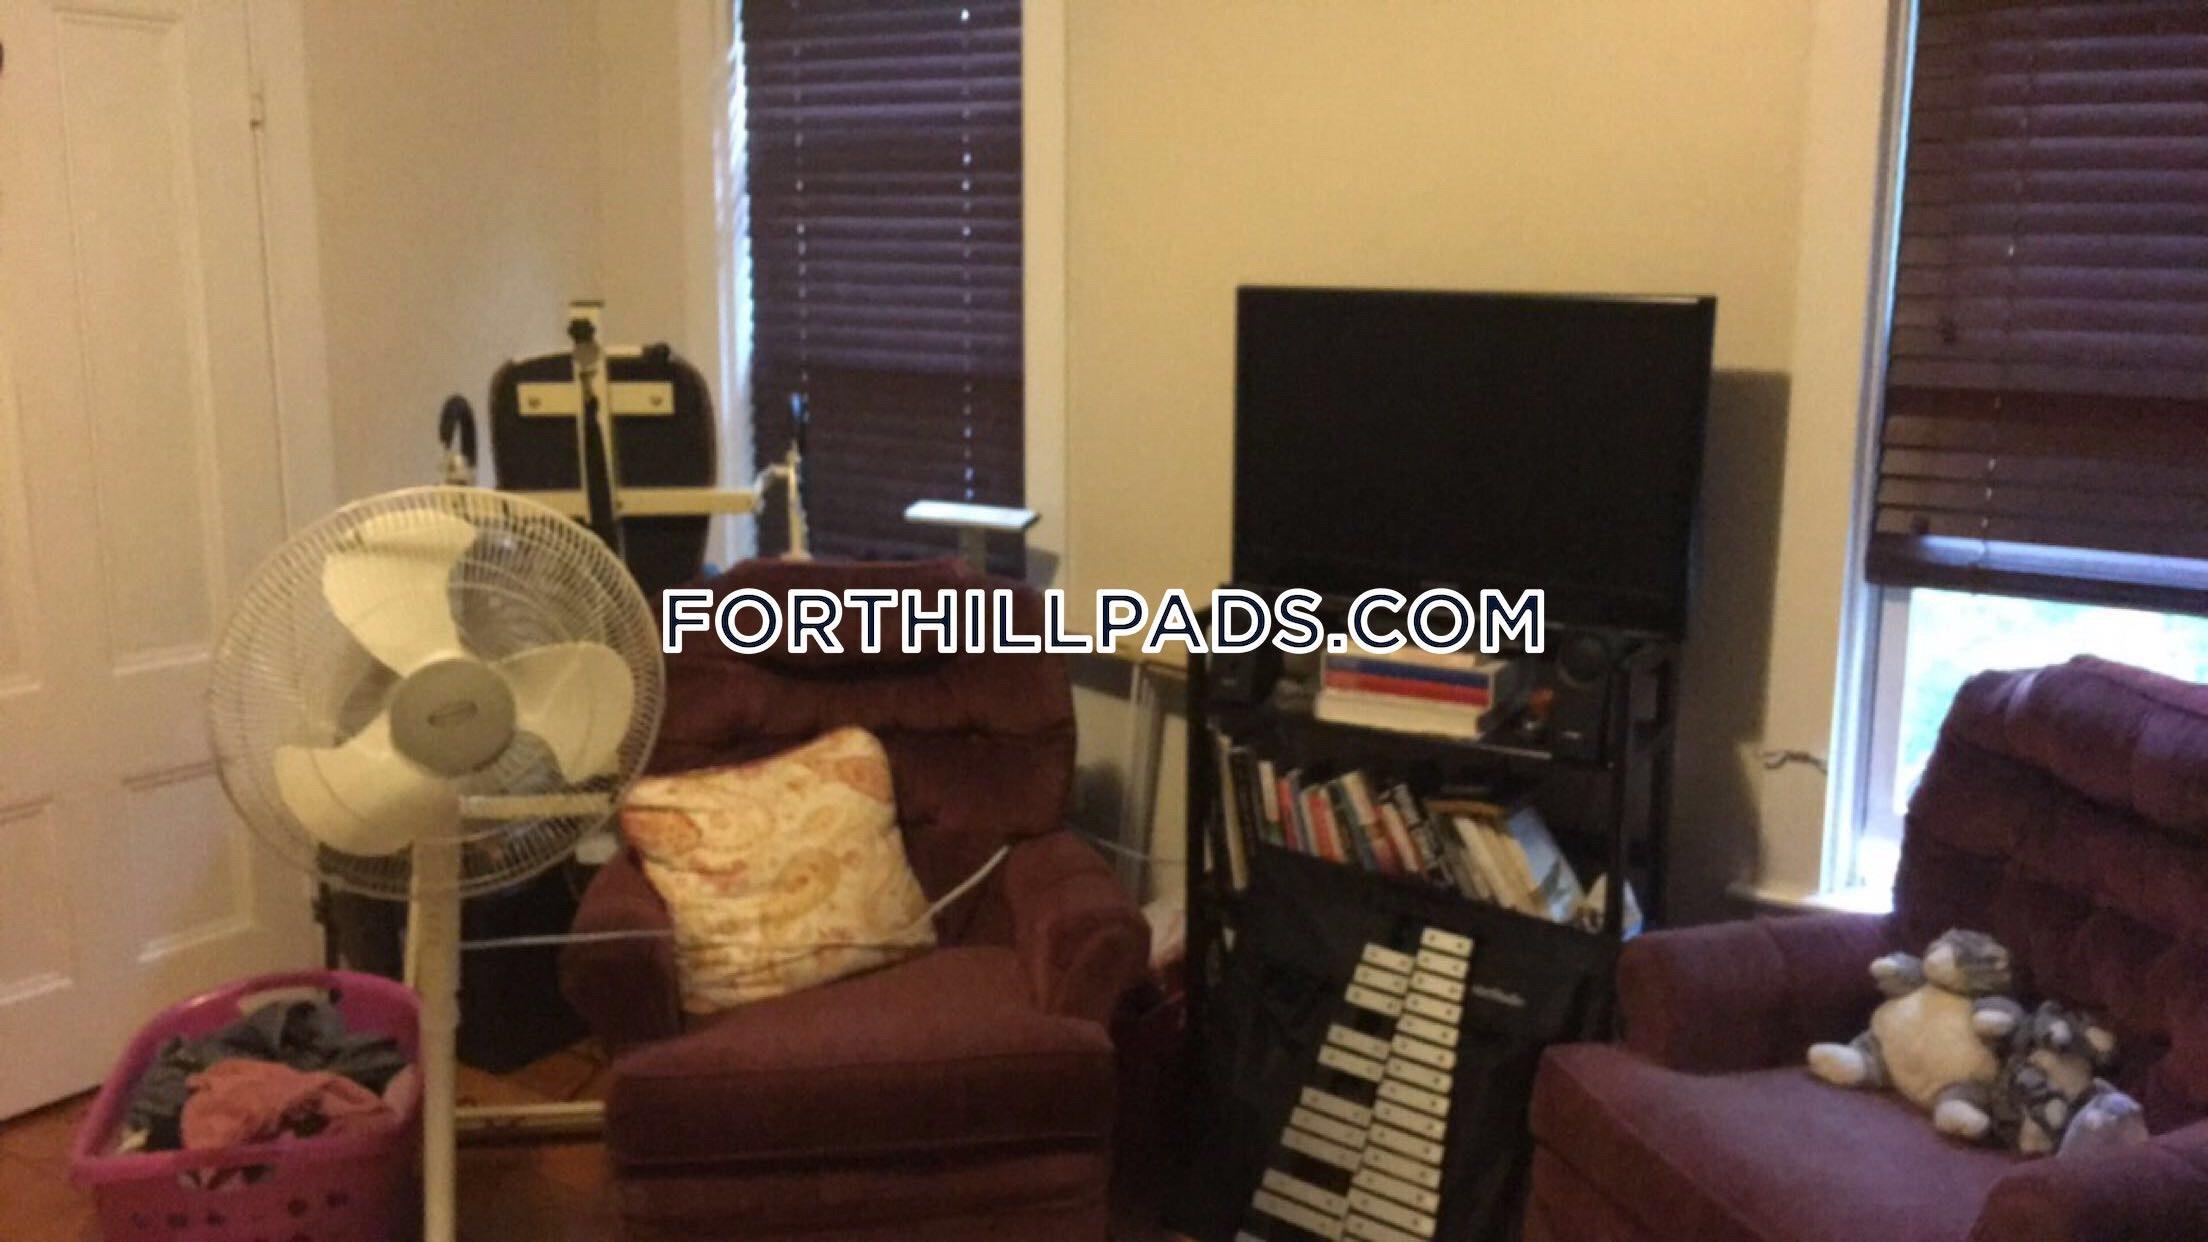 Fort hill apartments 1 bed 1 bath boston boston fort hill 1850 1 bed 1 bath boston boston fort hill 1850 amipublicfo Choice Image